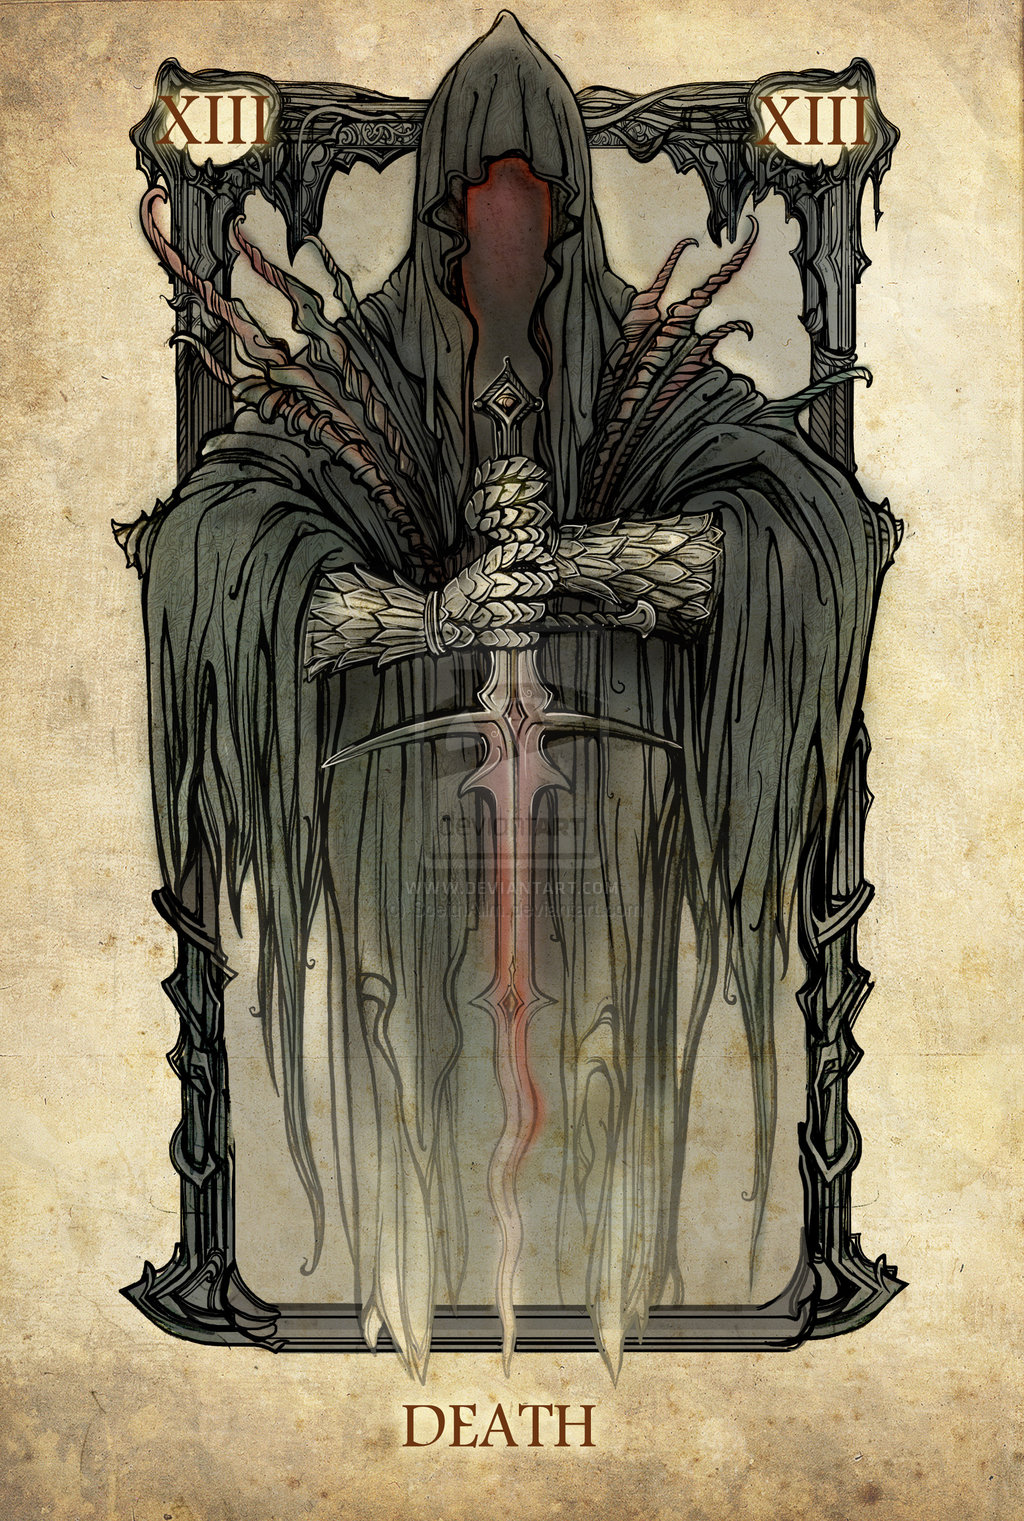 tarot__death_by_sceithailm-d6ey6nu